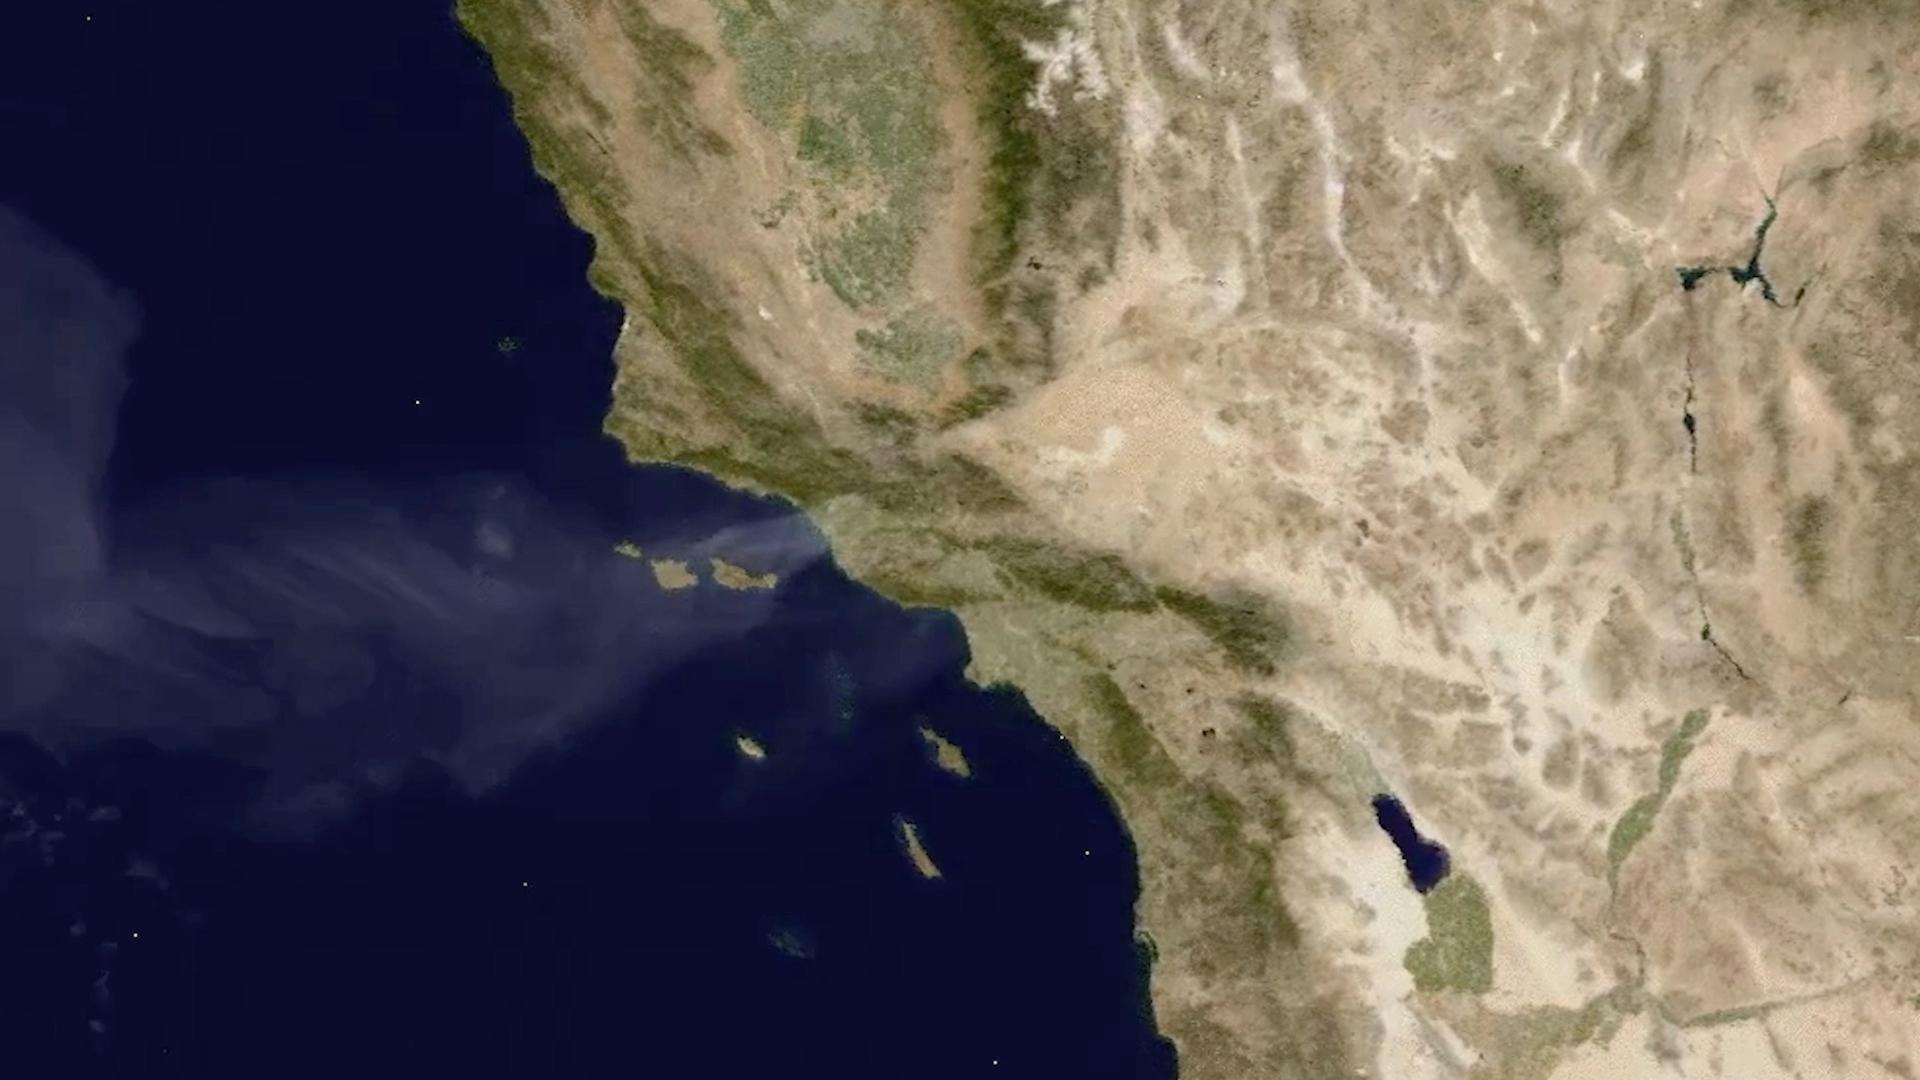 solar map of california, travel of california, sky map of california, forecast of california, detailed map of california, aerial photograph of california, earth map of california, traffic map of california, education map of california, entertainment map of california, city of california, street view of california, military map of california, wi-fi map of california, food of california, large map of california, humidity of california, atlas map of california, hotels of california, topographic map of california, on satellite maps of california